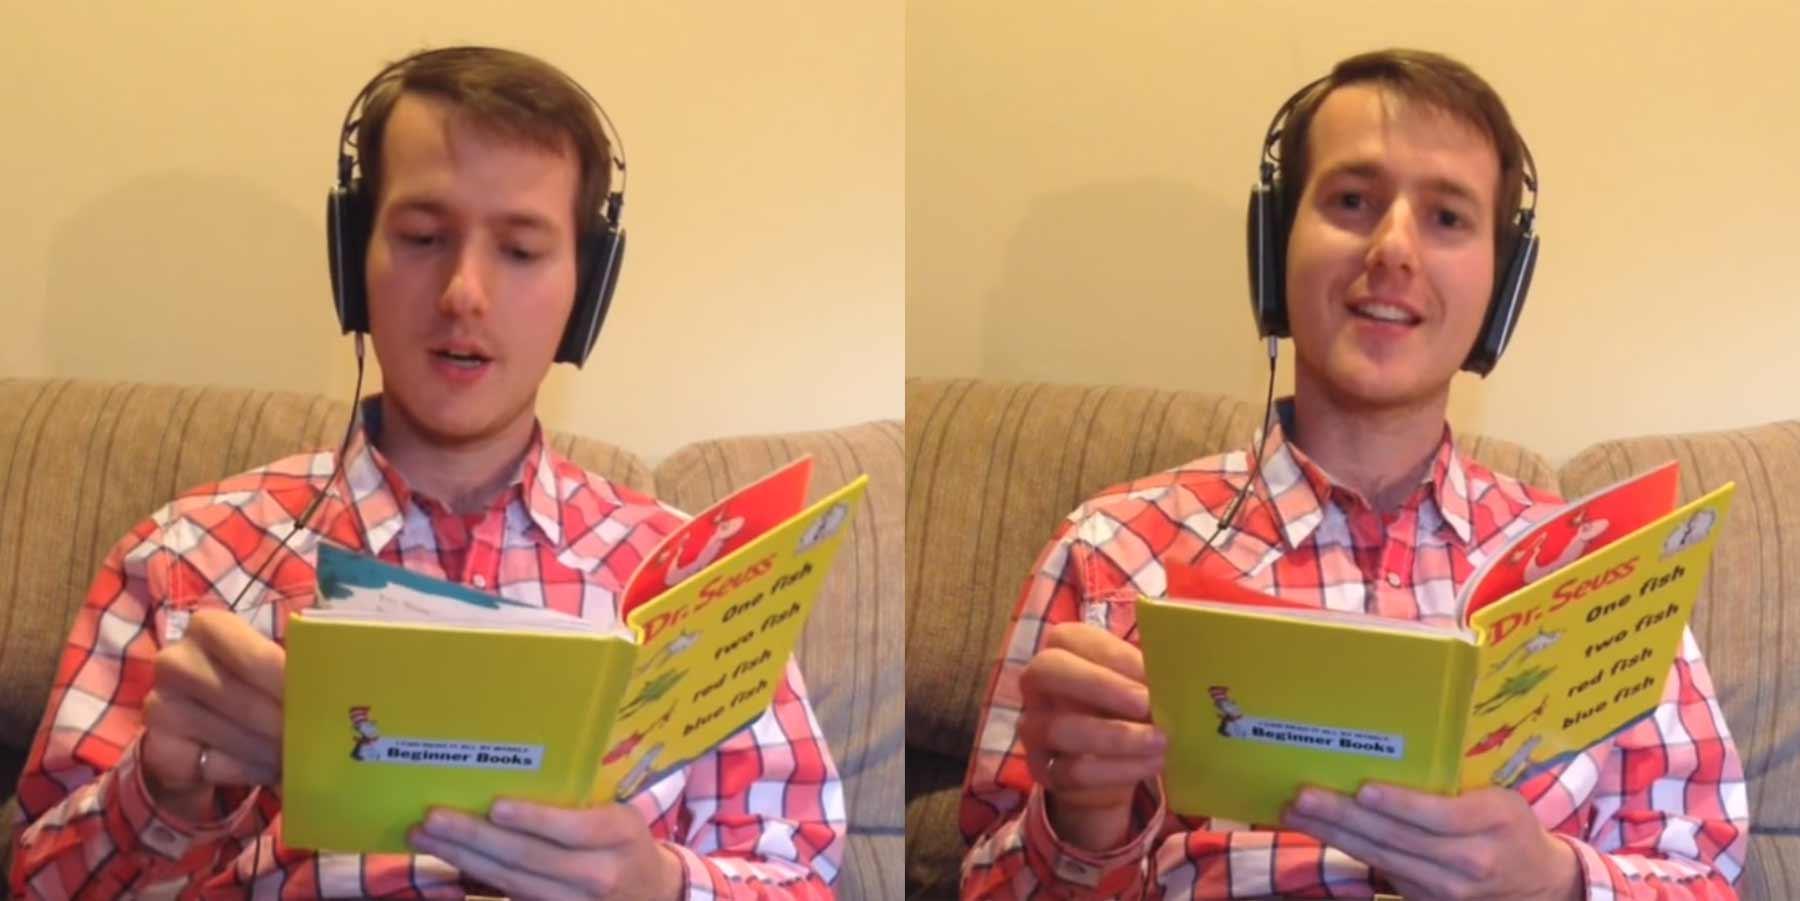 Brainfuck: Sich beim Kinderbuch-Lesen leicht versetzt hören speech-jammer